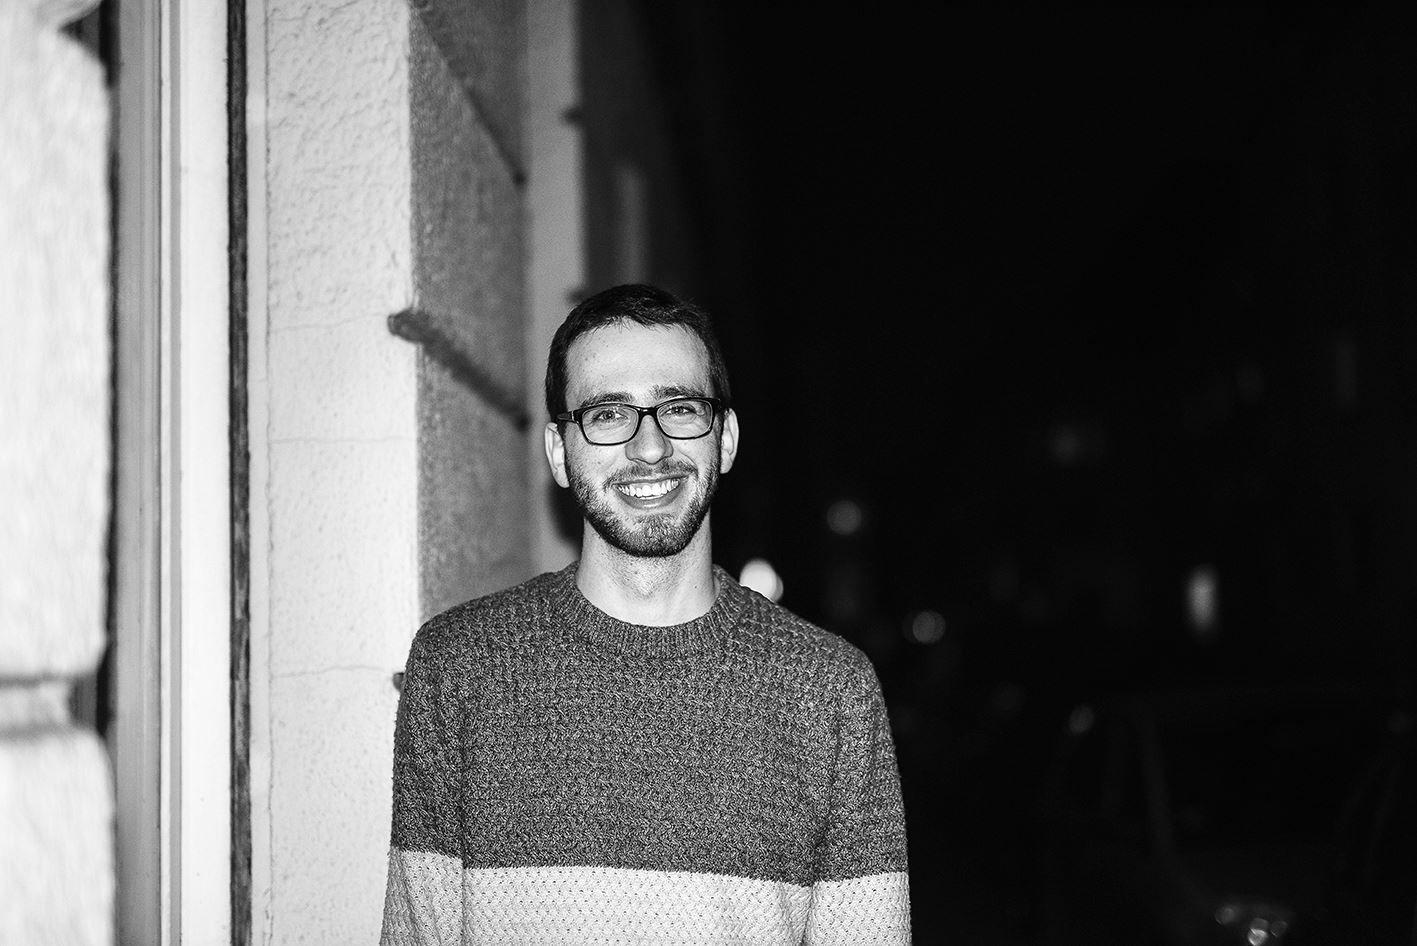 Nitay Feigenbaum / Lesereihe, November 2018